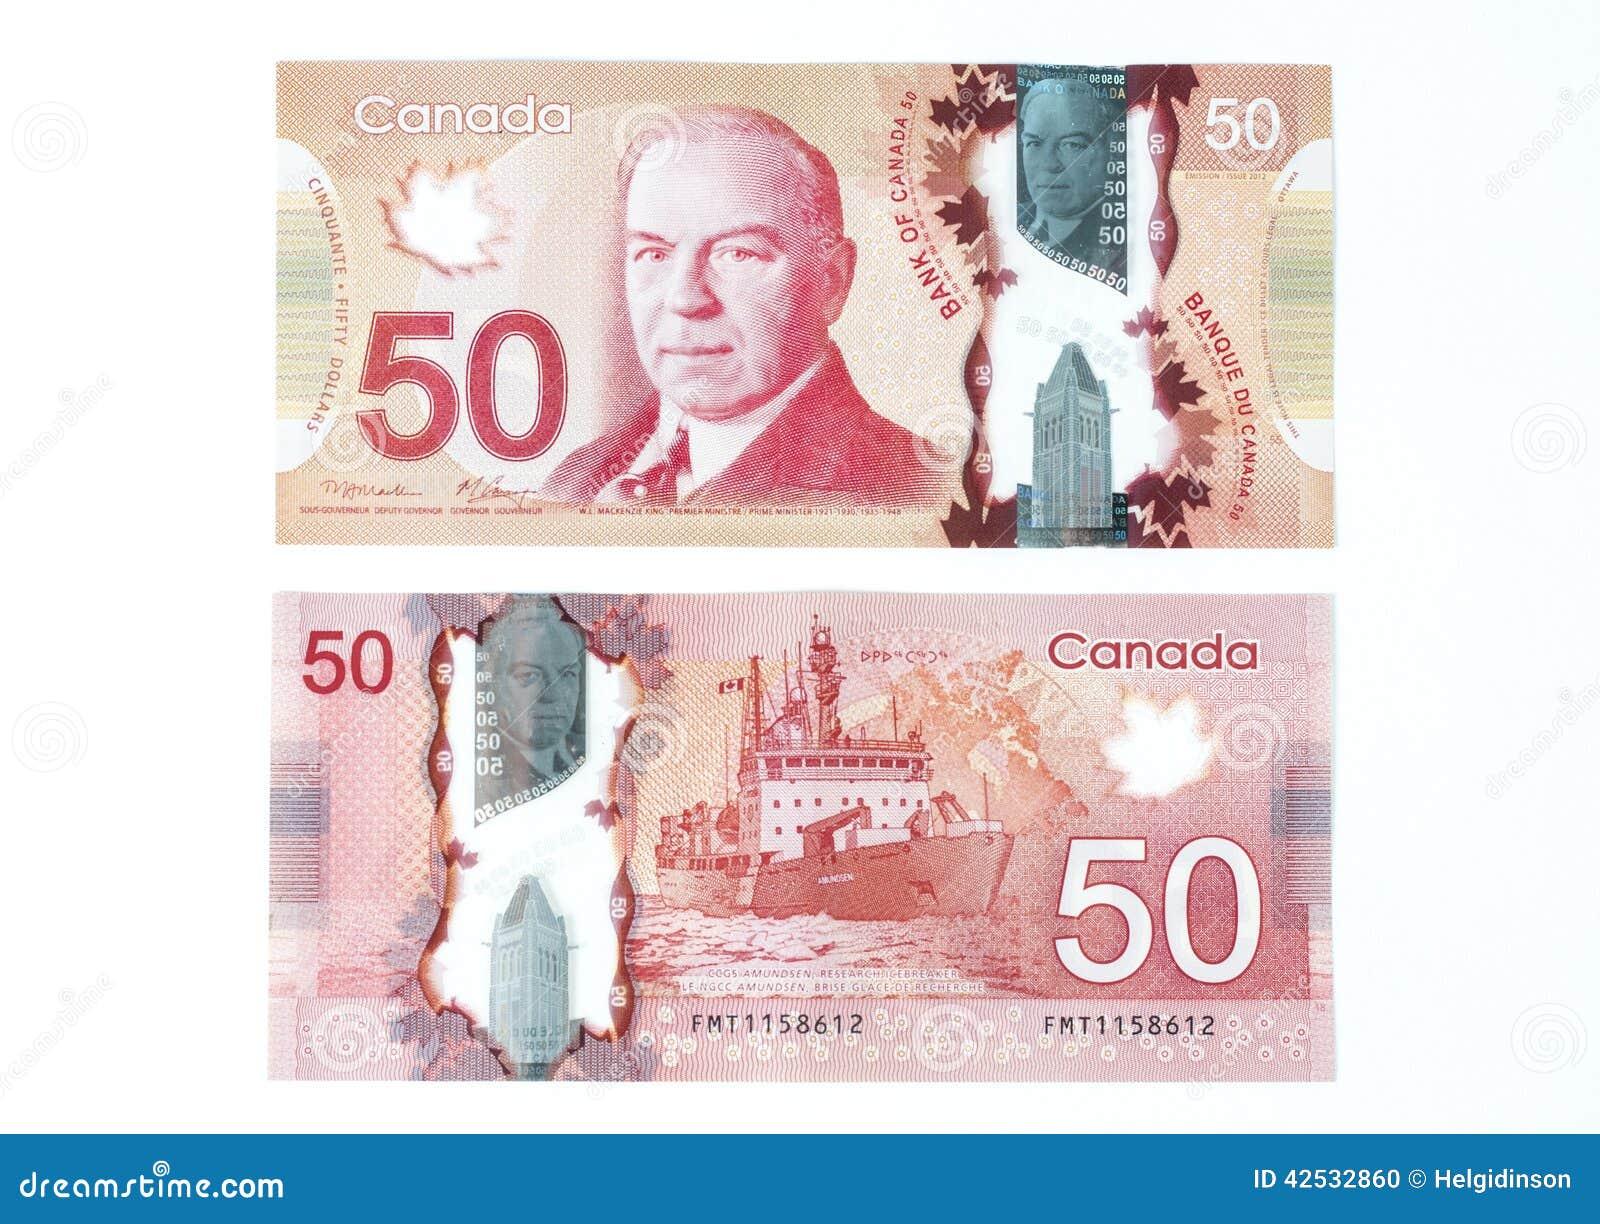 50 Canadian dollar bill